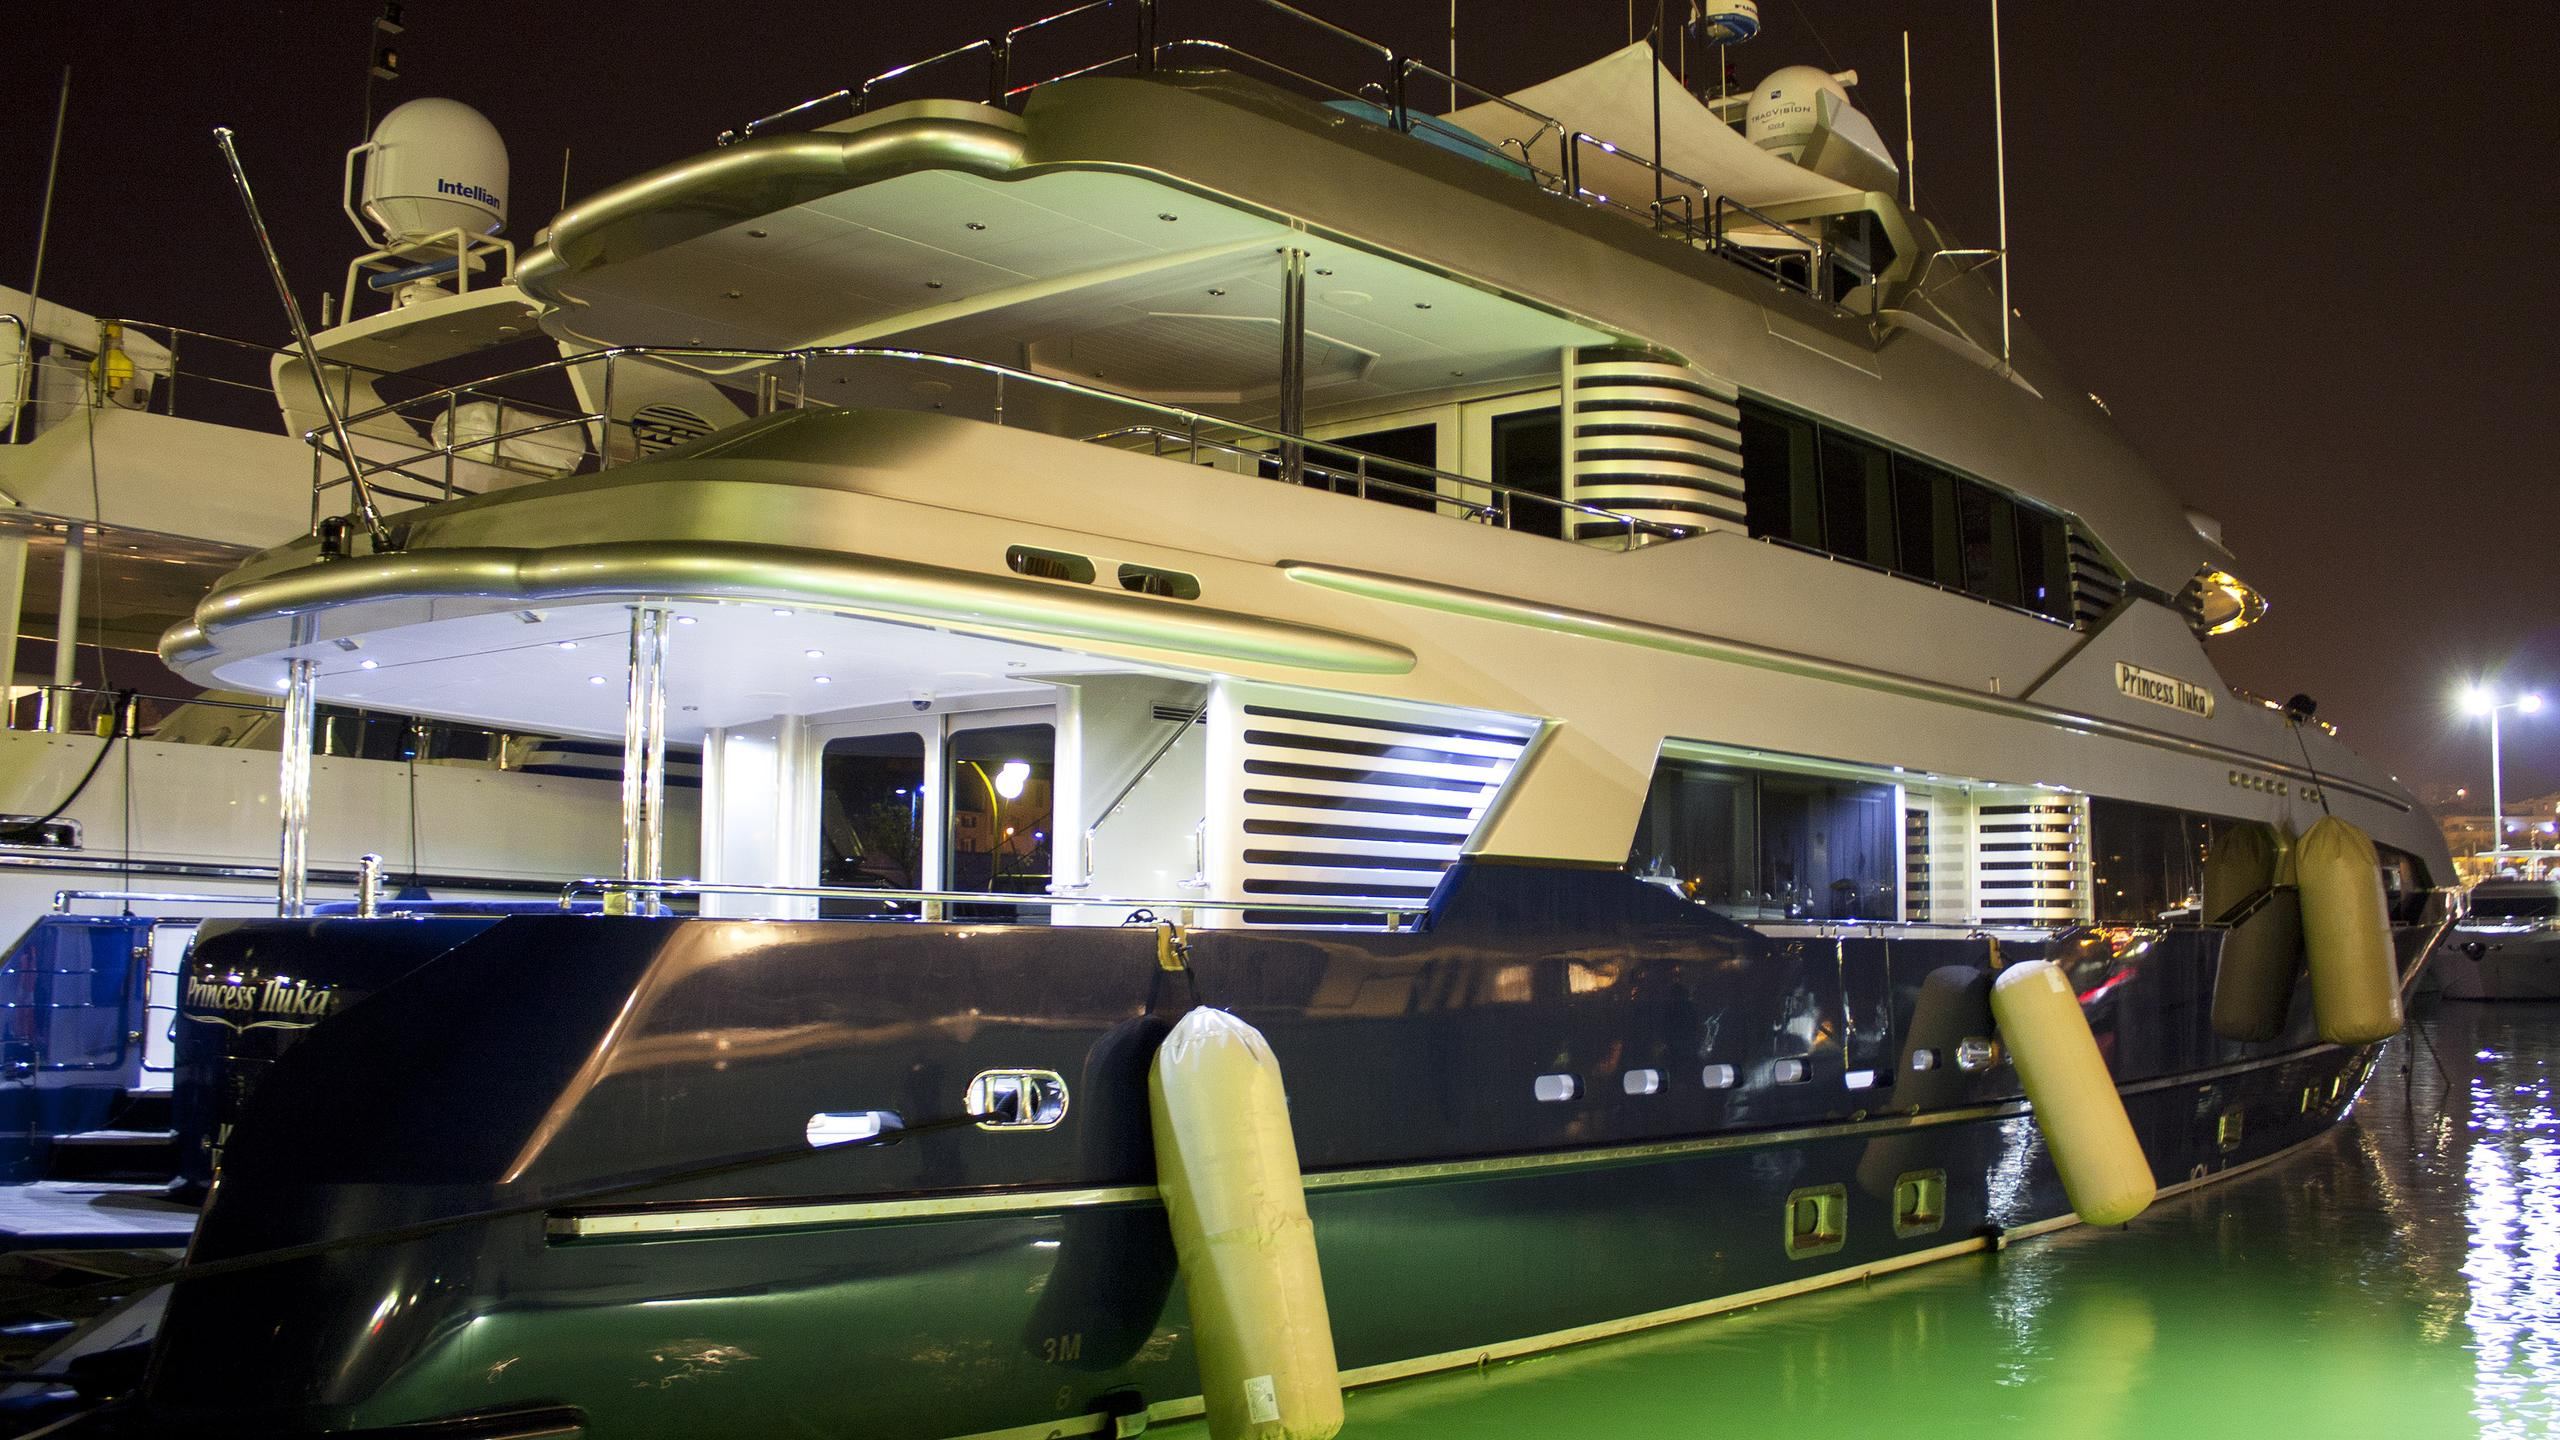 princess-iluka-motor-yacht-kemp-r-1979-37m-half-profile